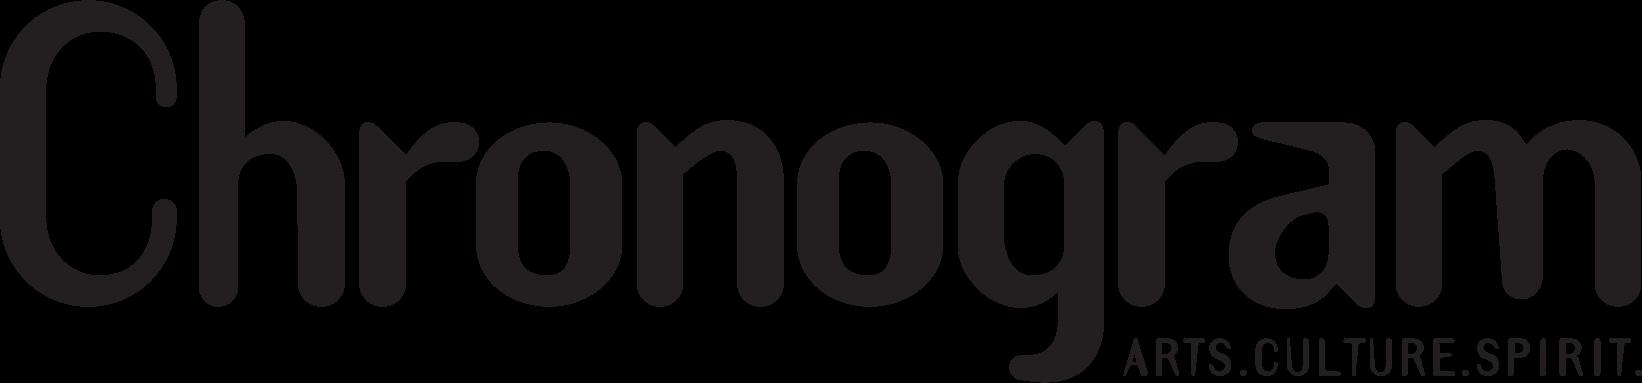 Chronogram Logo.png